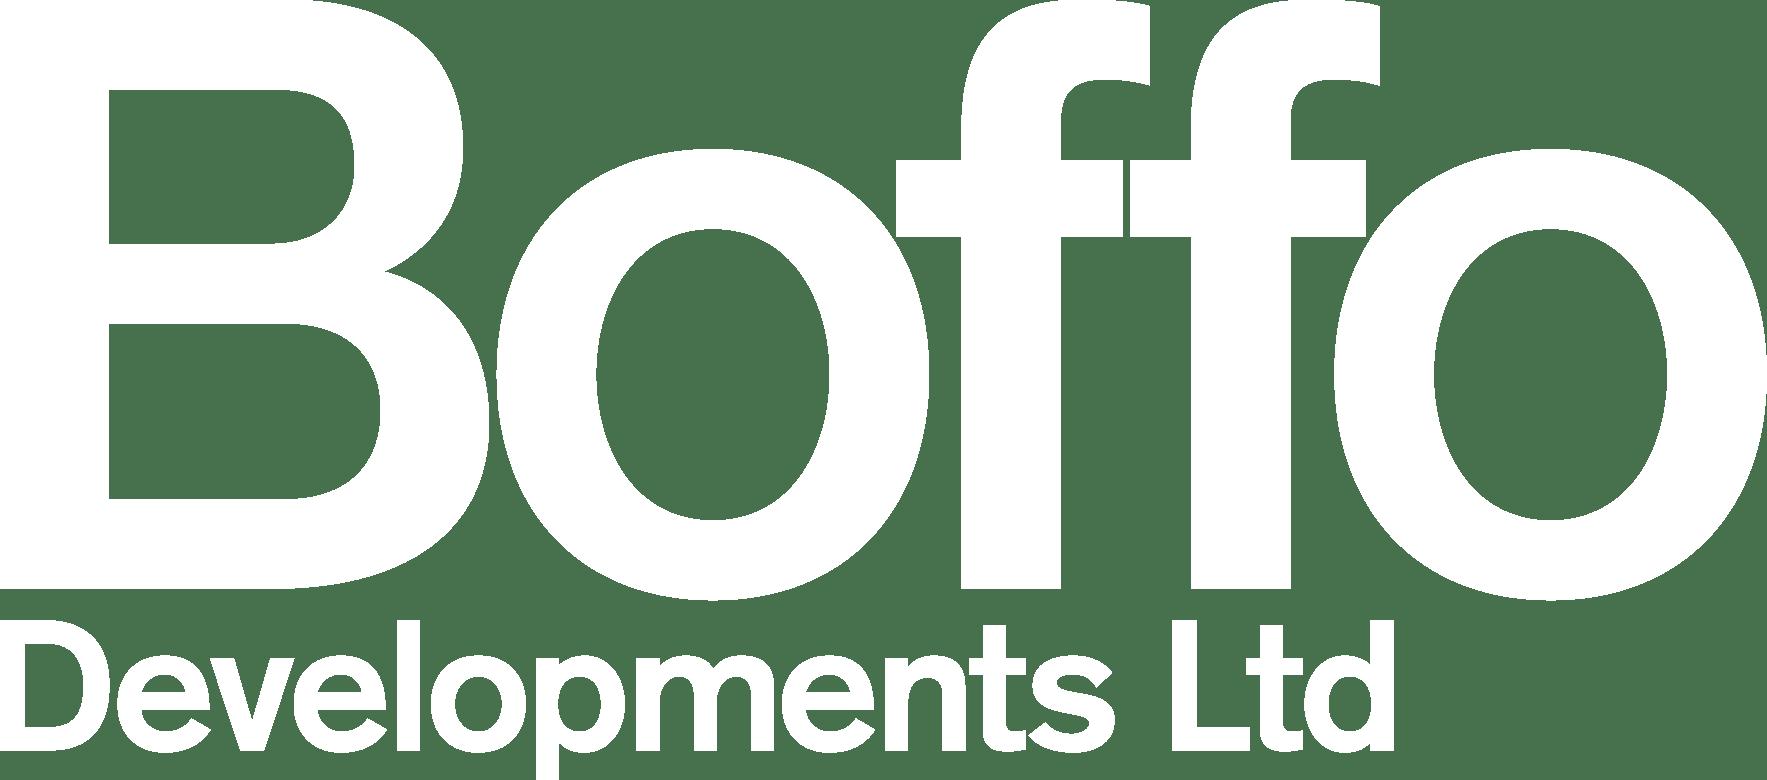 Boffo Developments LTD